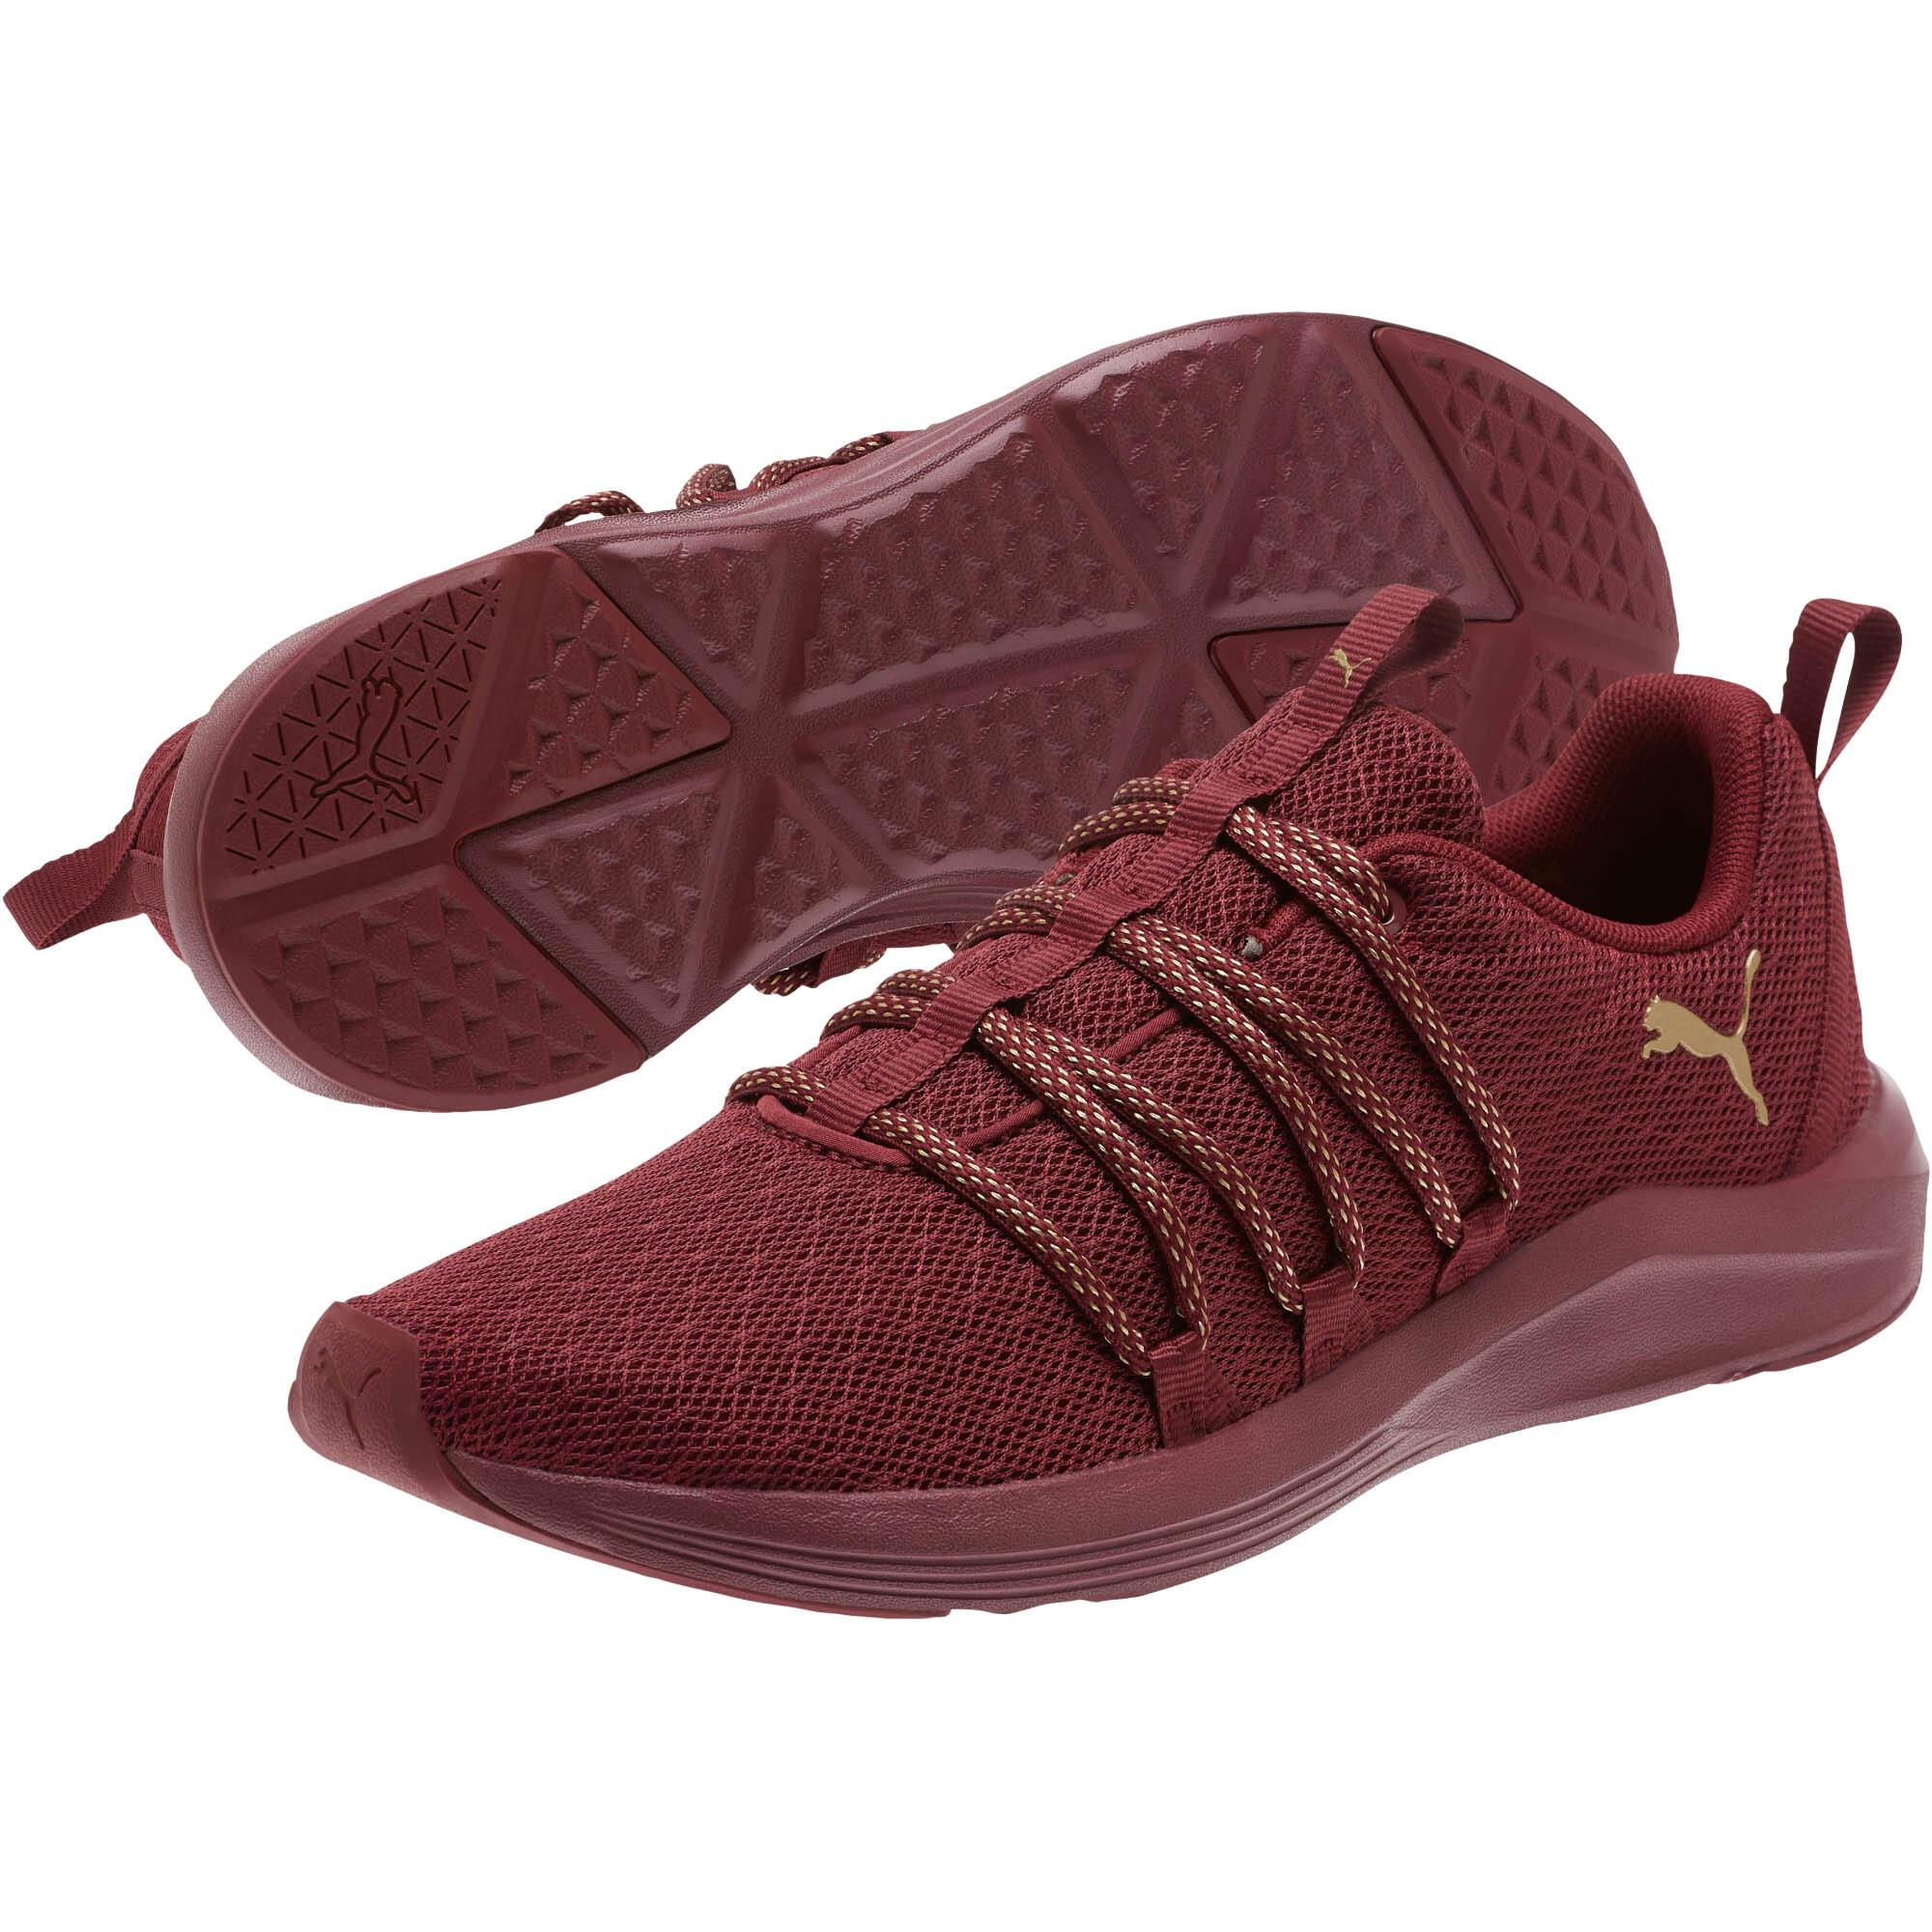 Details about PUMA Women's Prowl Alt Knit Mesh Running Shoes